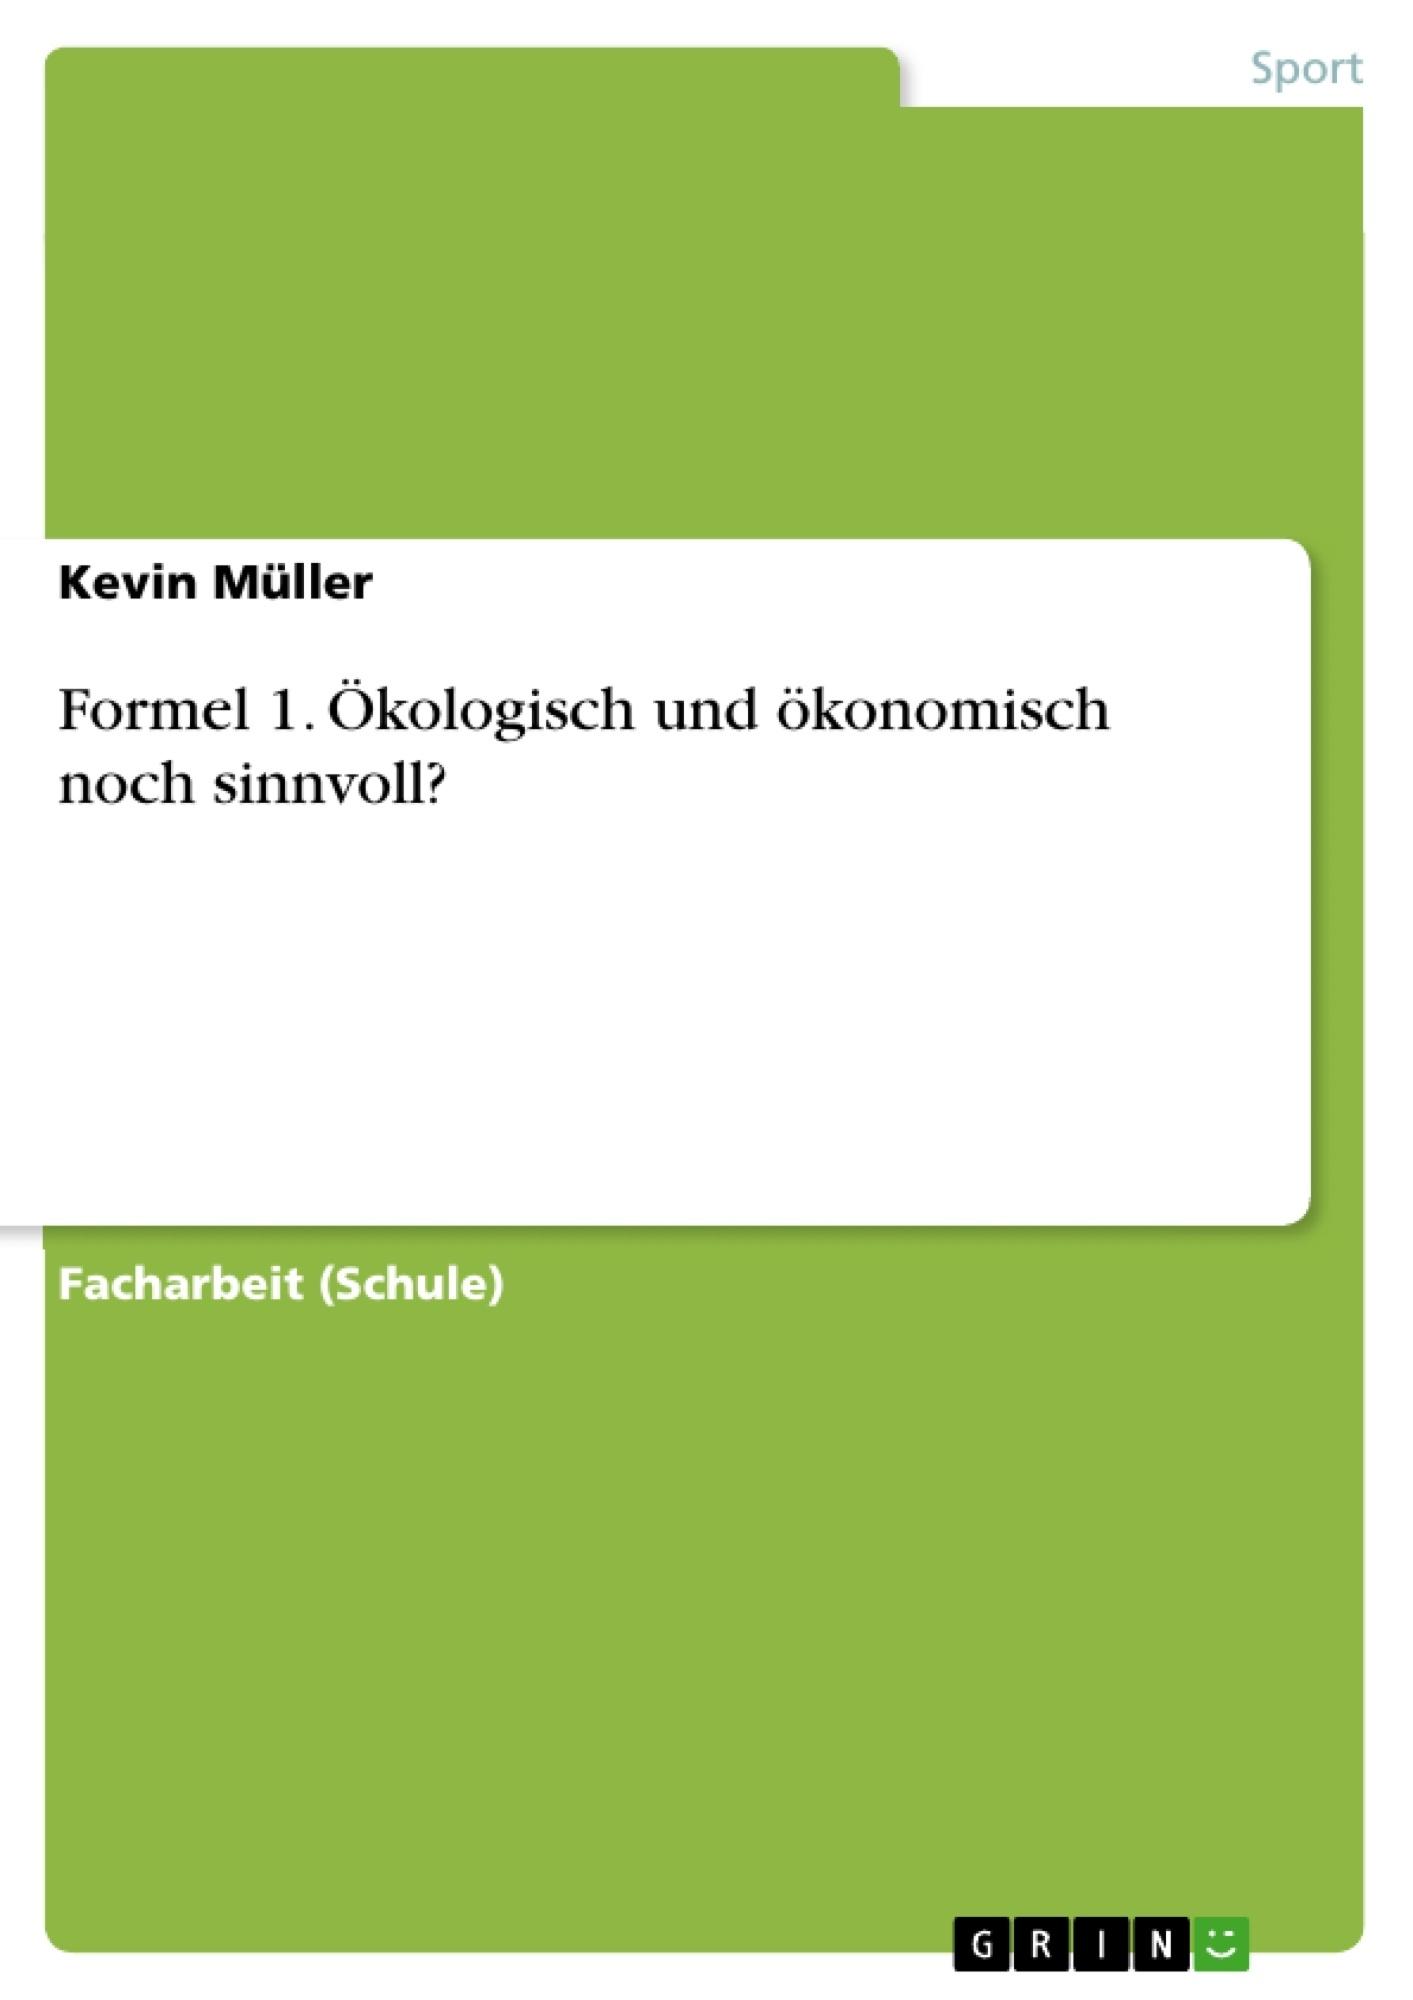 Titel: Formel 1. Ökologisch und ökonomisch noch sinnvoll?